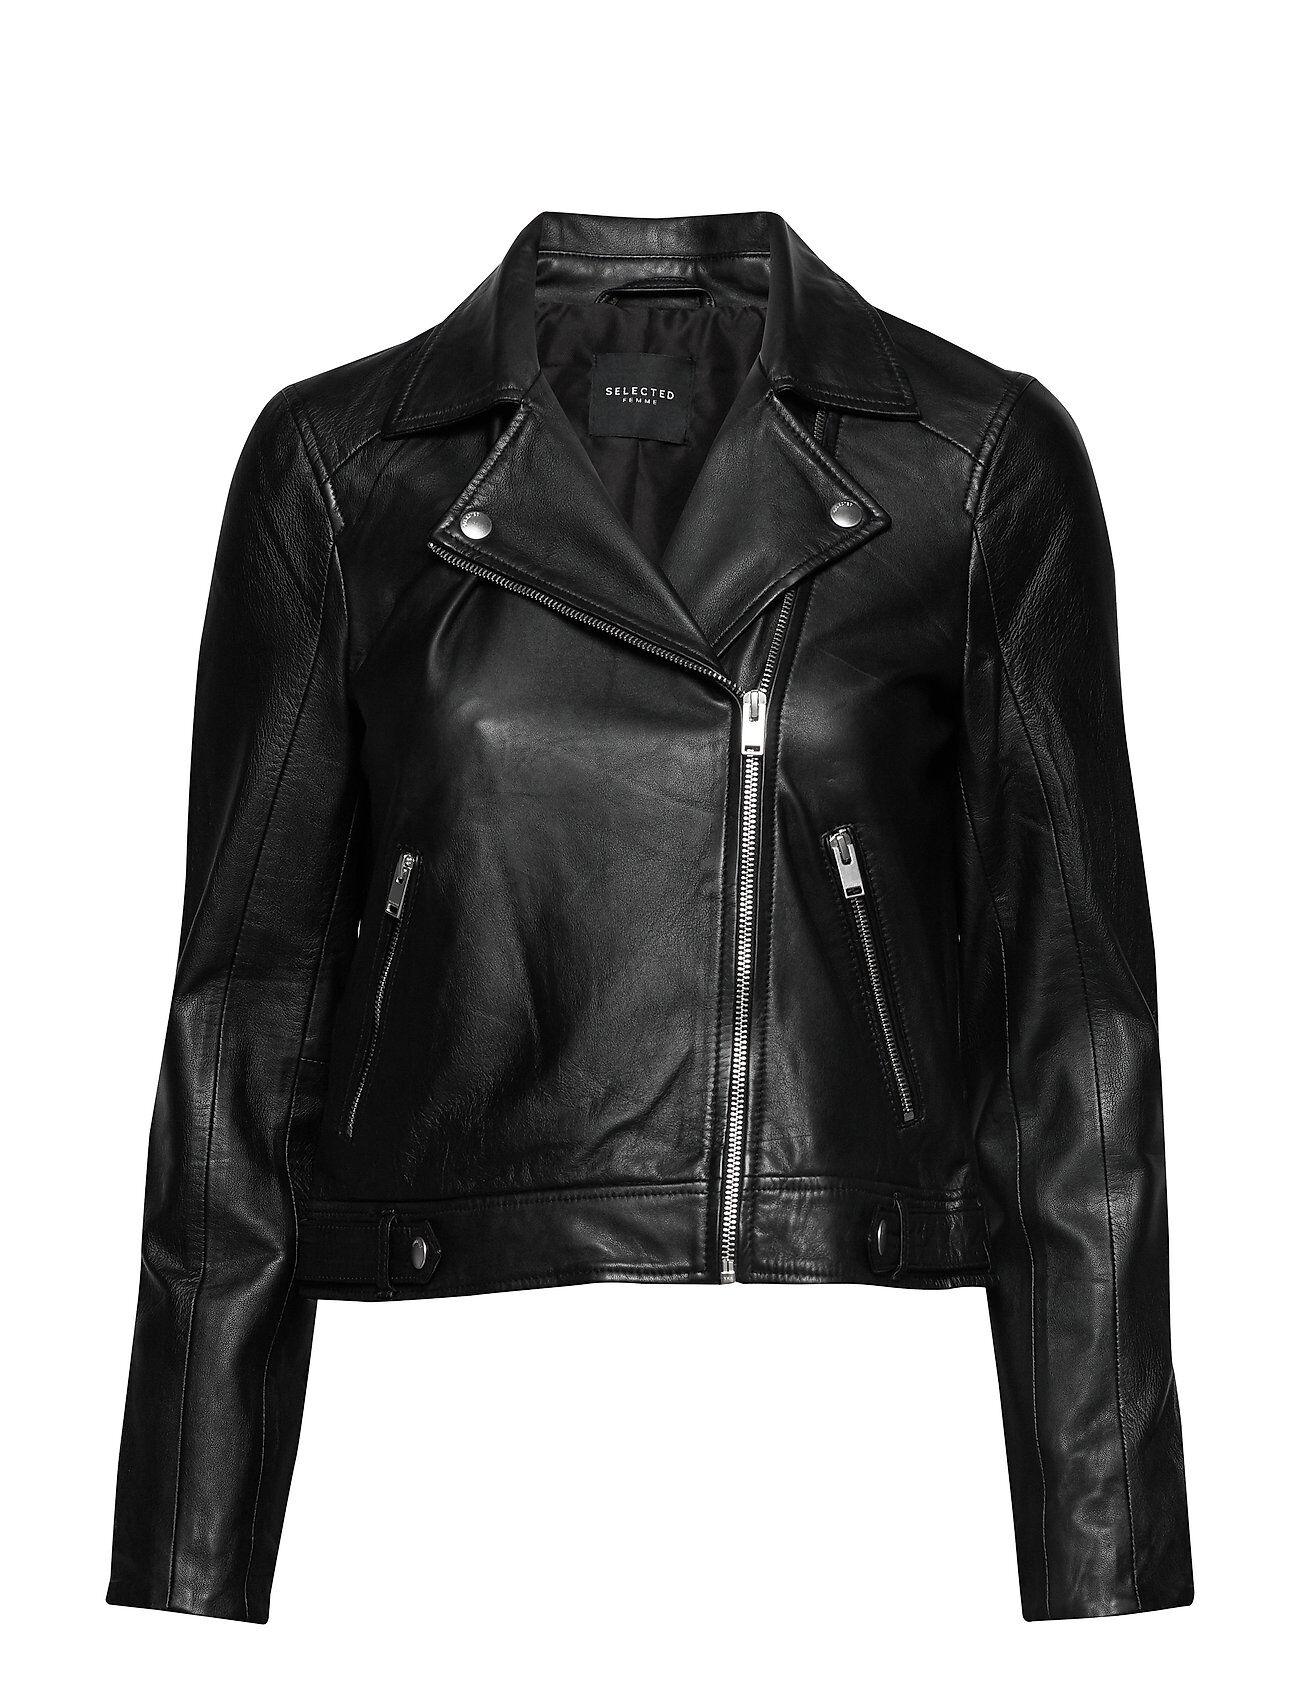 Selected Femme Slfkatie Leather Jacket B Noos Nahkatakki Musta Selected Femme